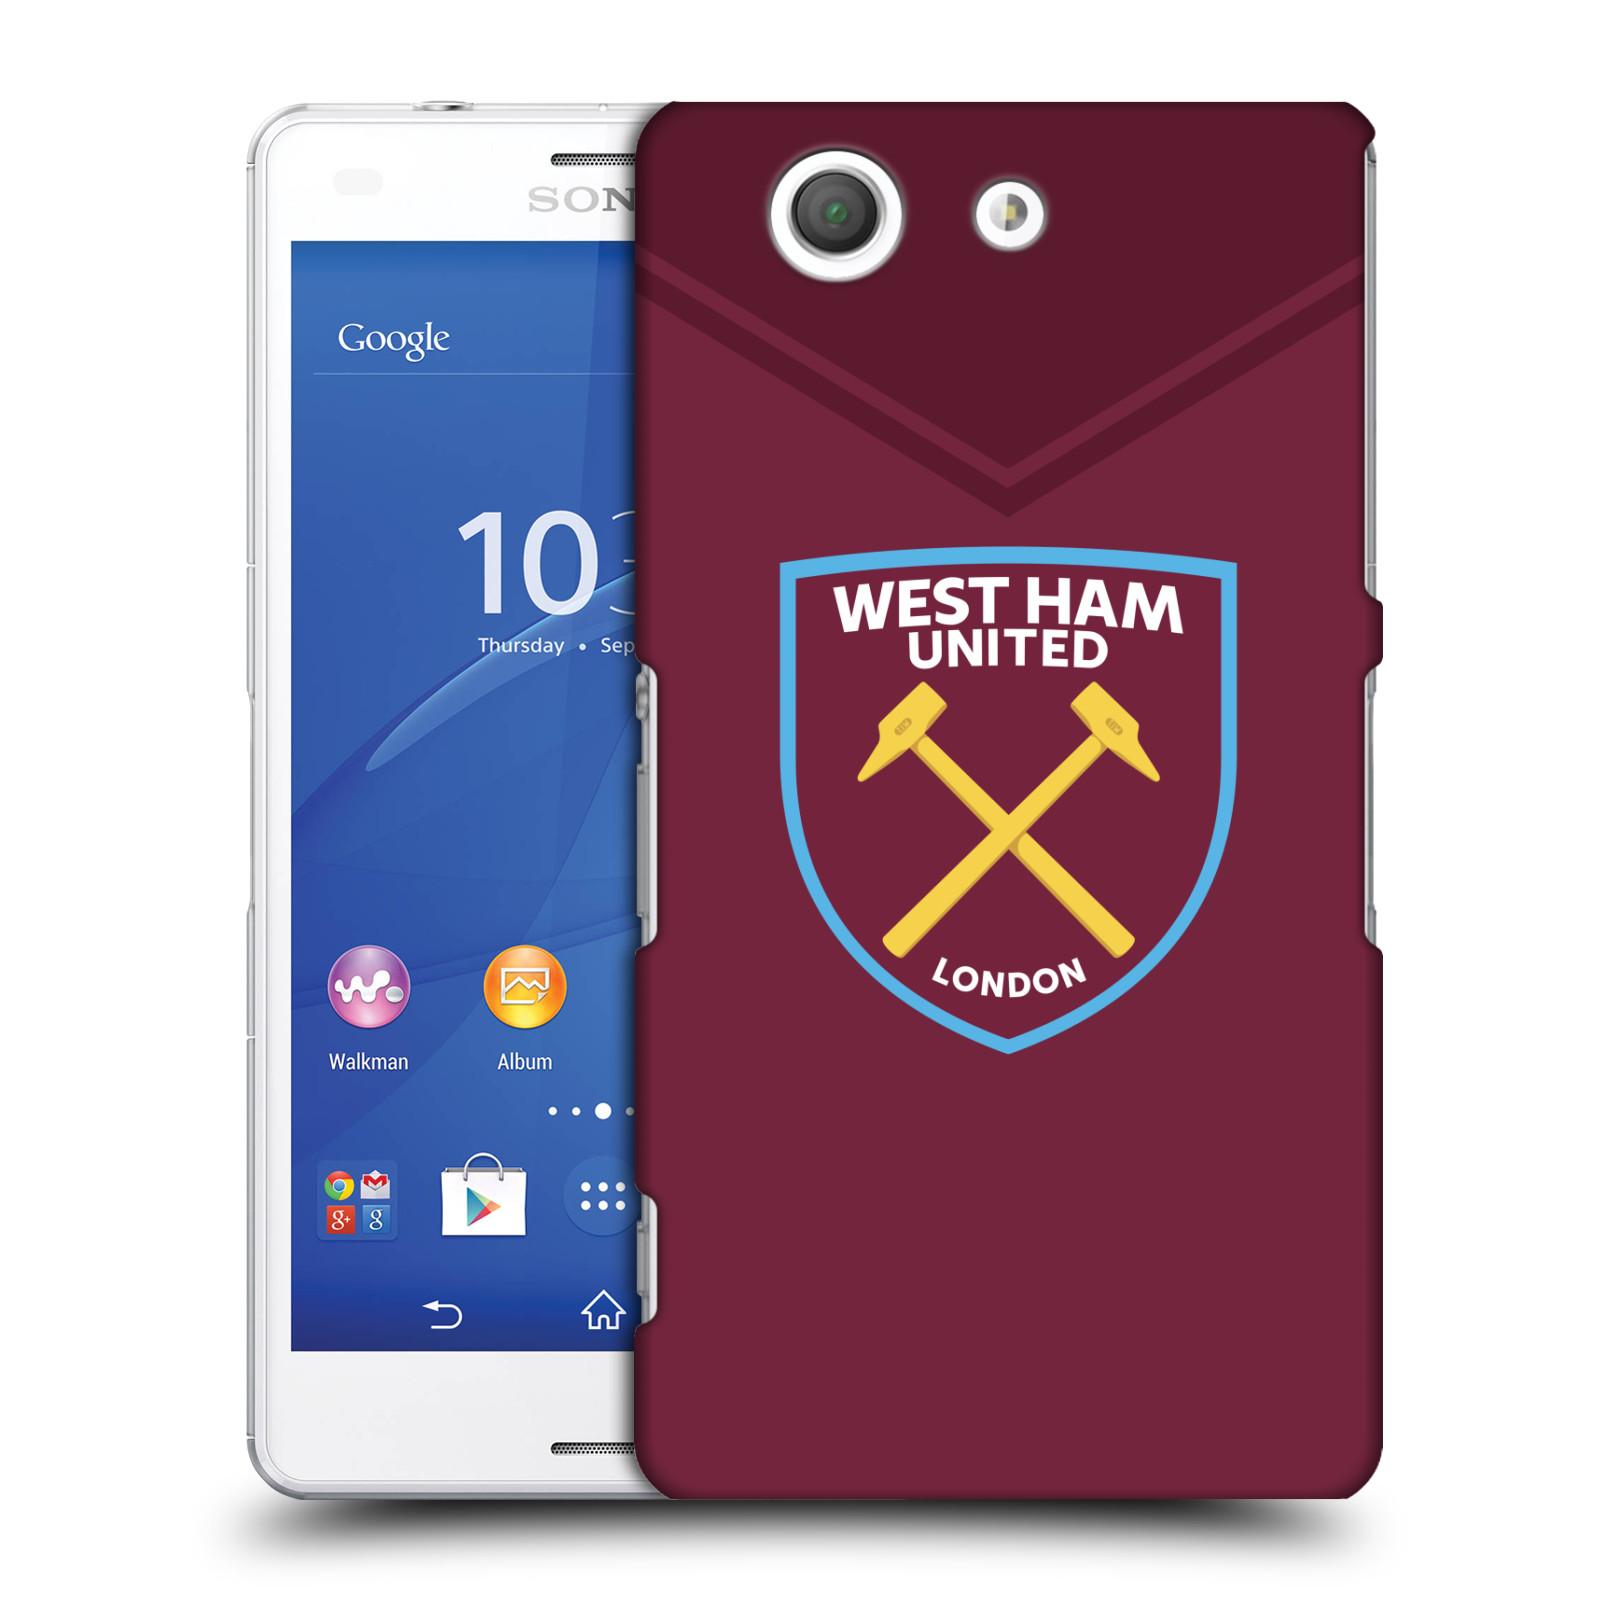 Plastové pouzdro na mobil Sony Xperia Z3 Compact D5803 - Head Case - West Ham United - Logo